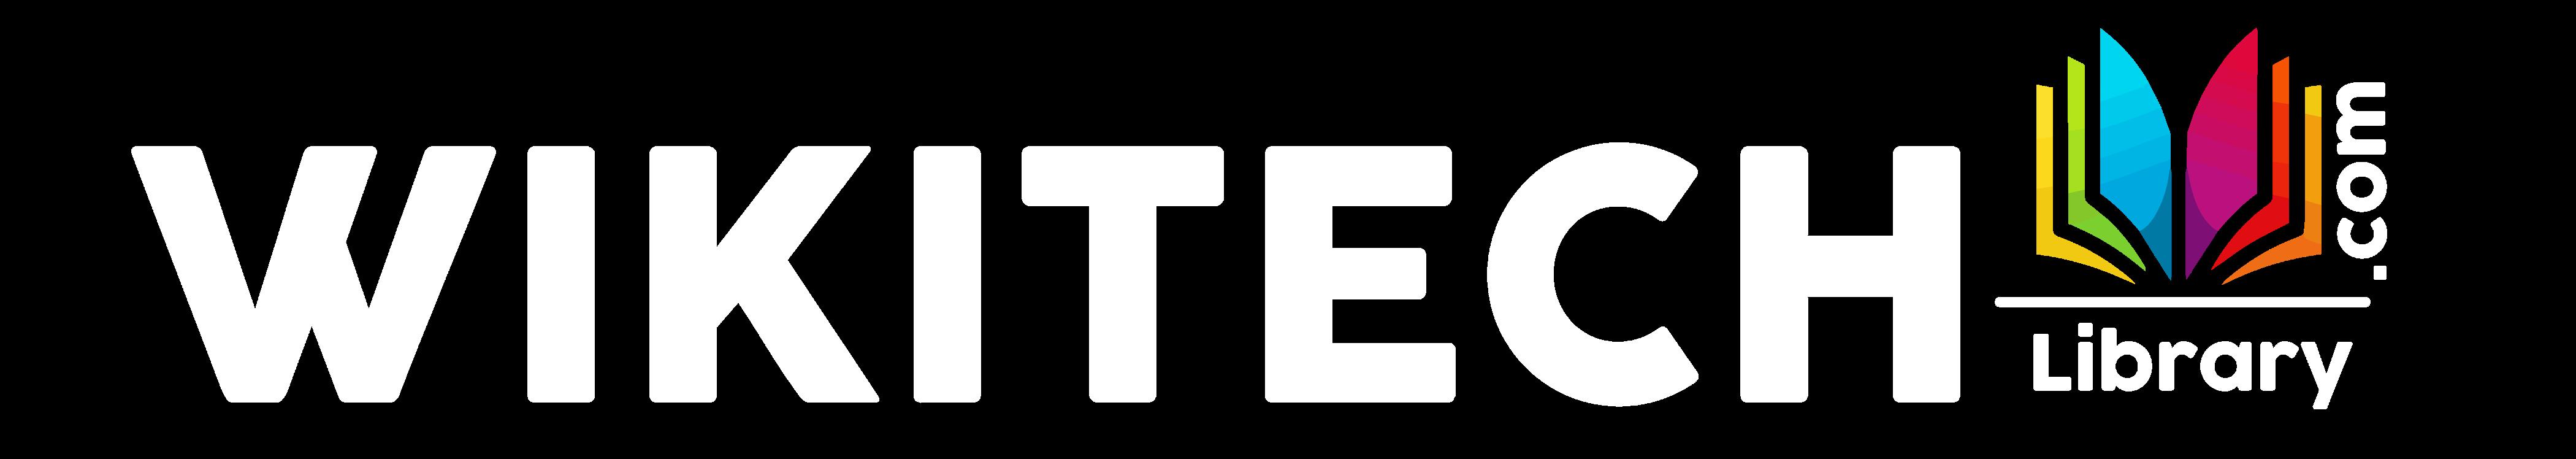 WikiTechLibrary | Latest Telecom and Technology News in Pakistan